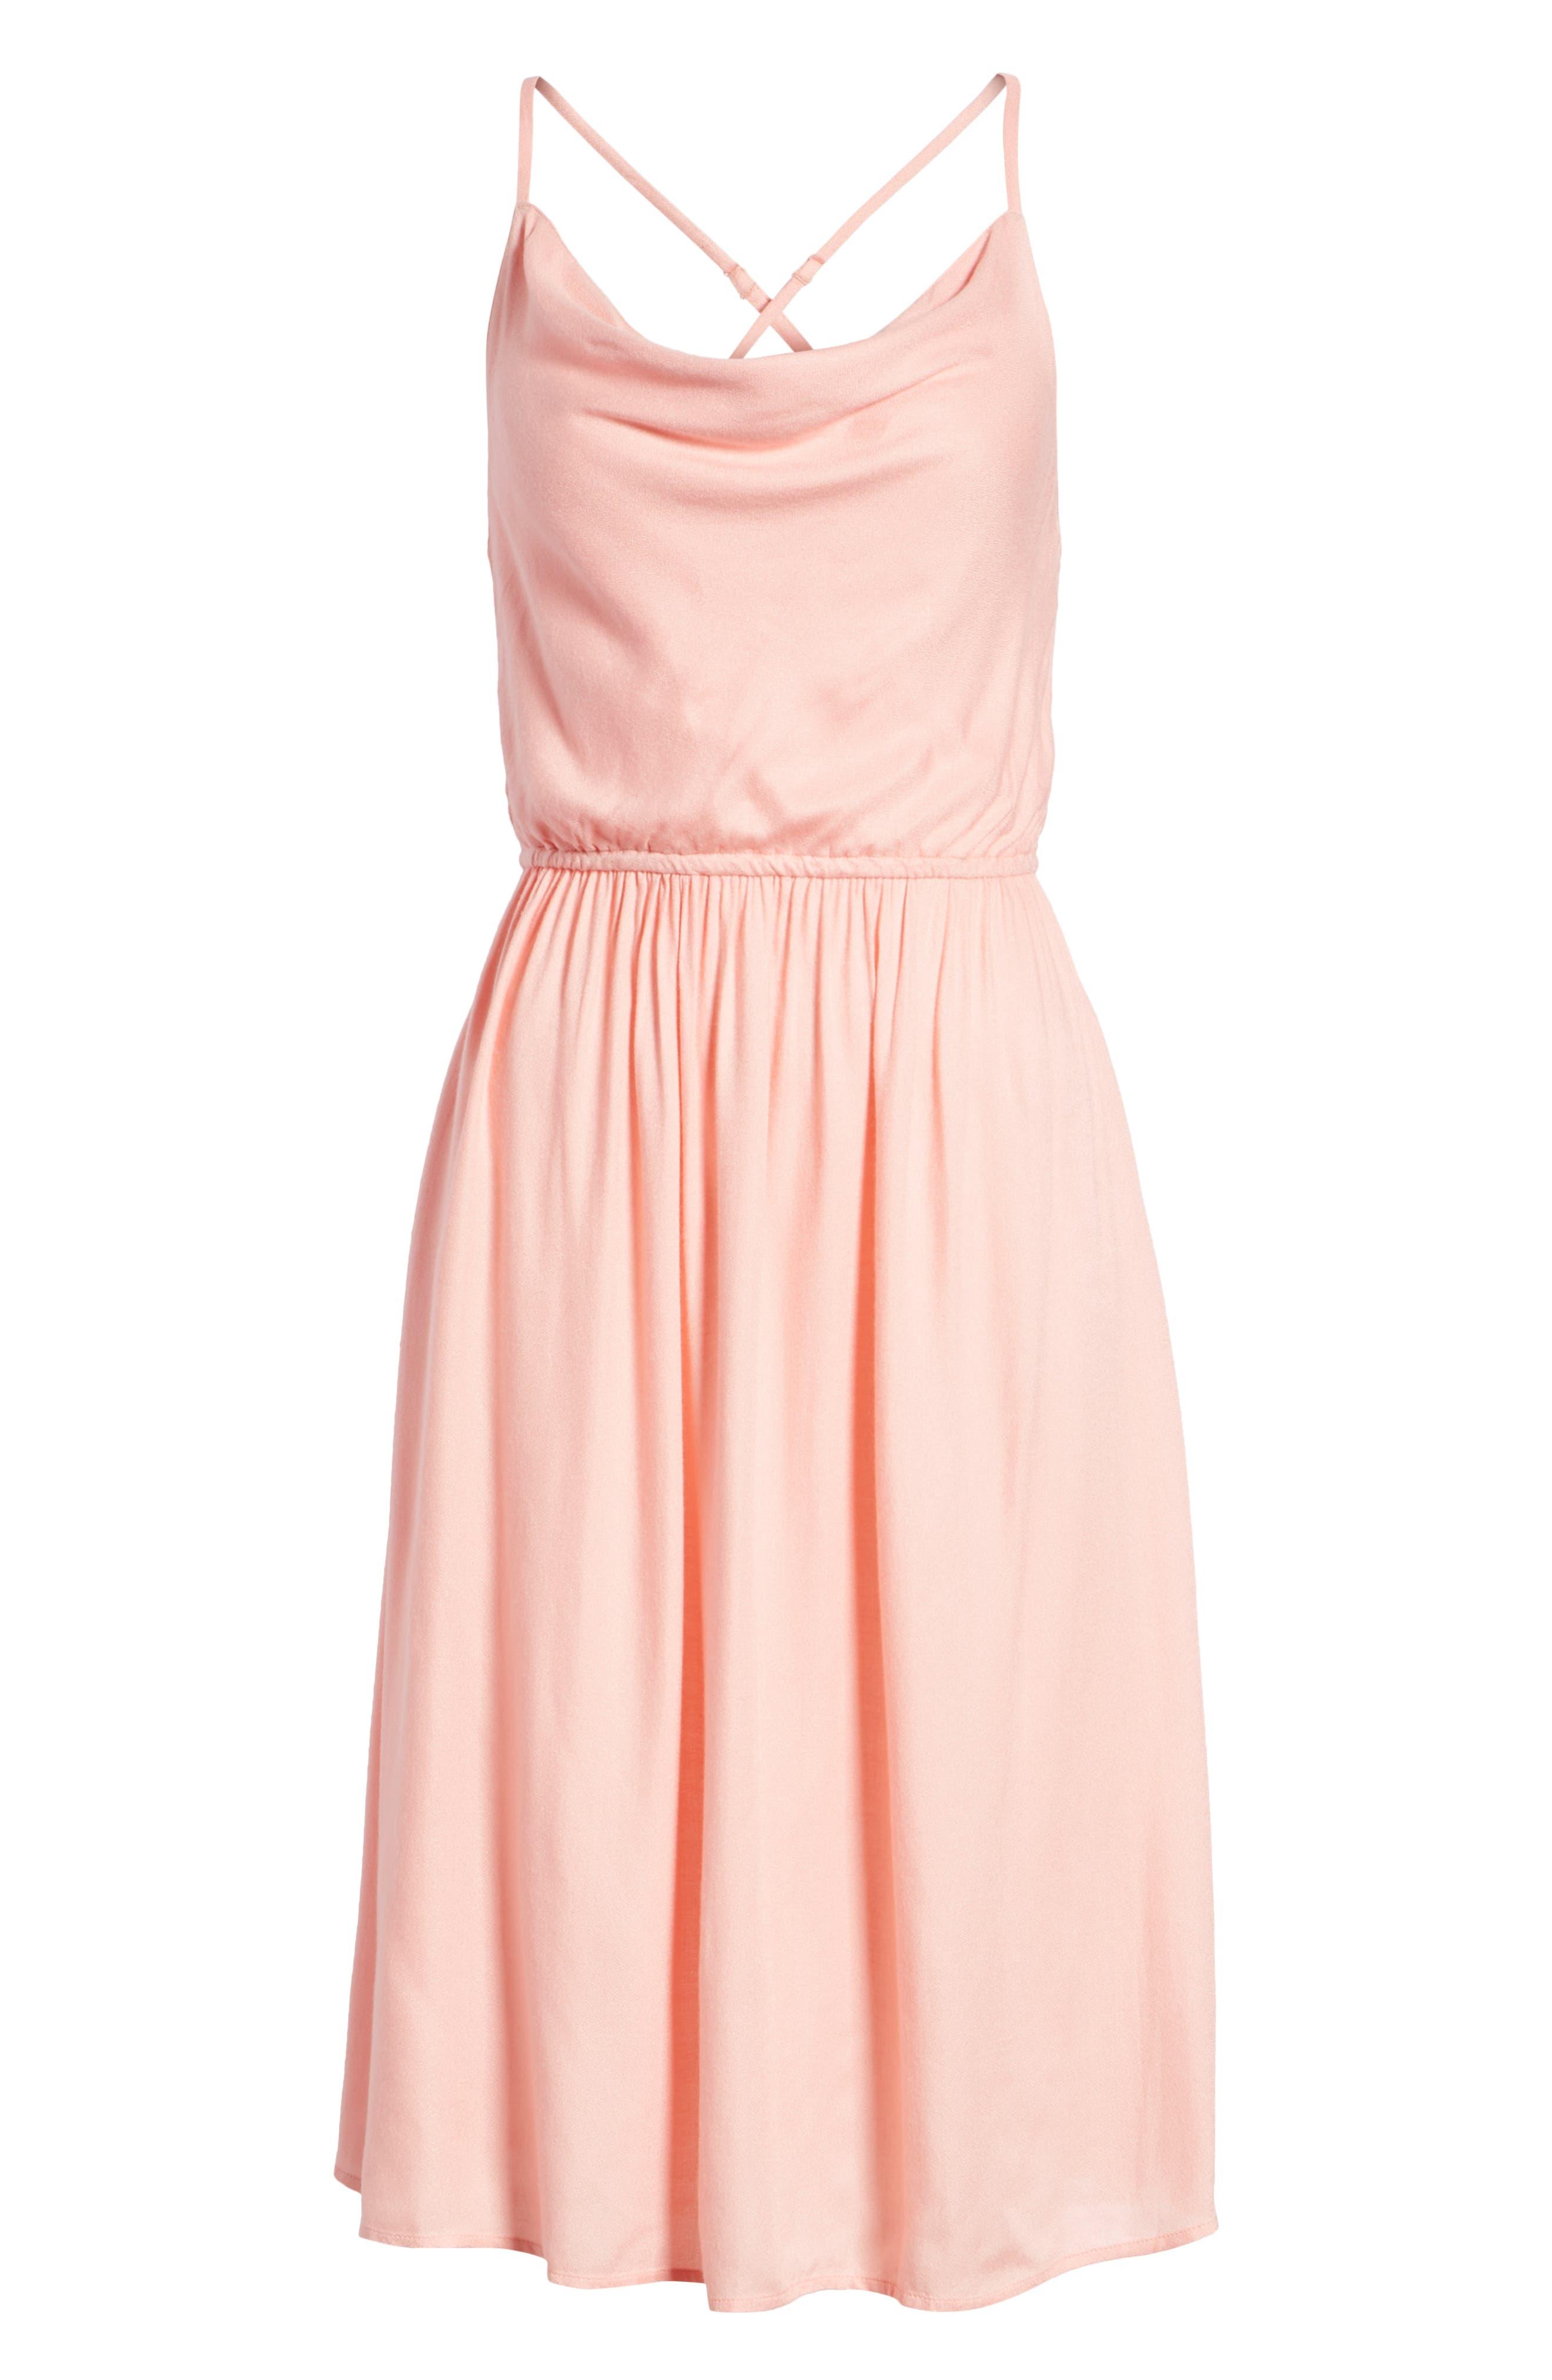 Mystic Mama Dress,                             Alternate thumbnail 7, color,                             950